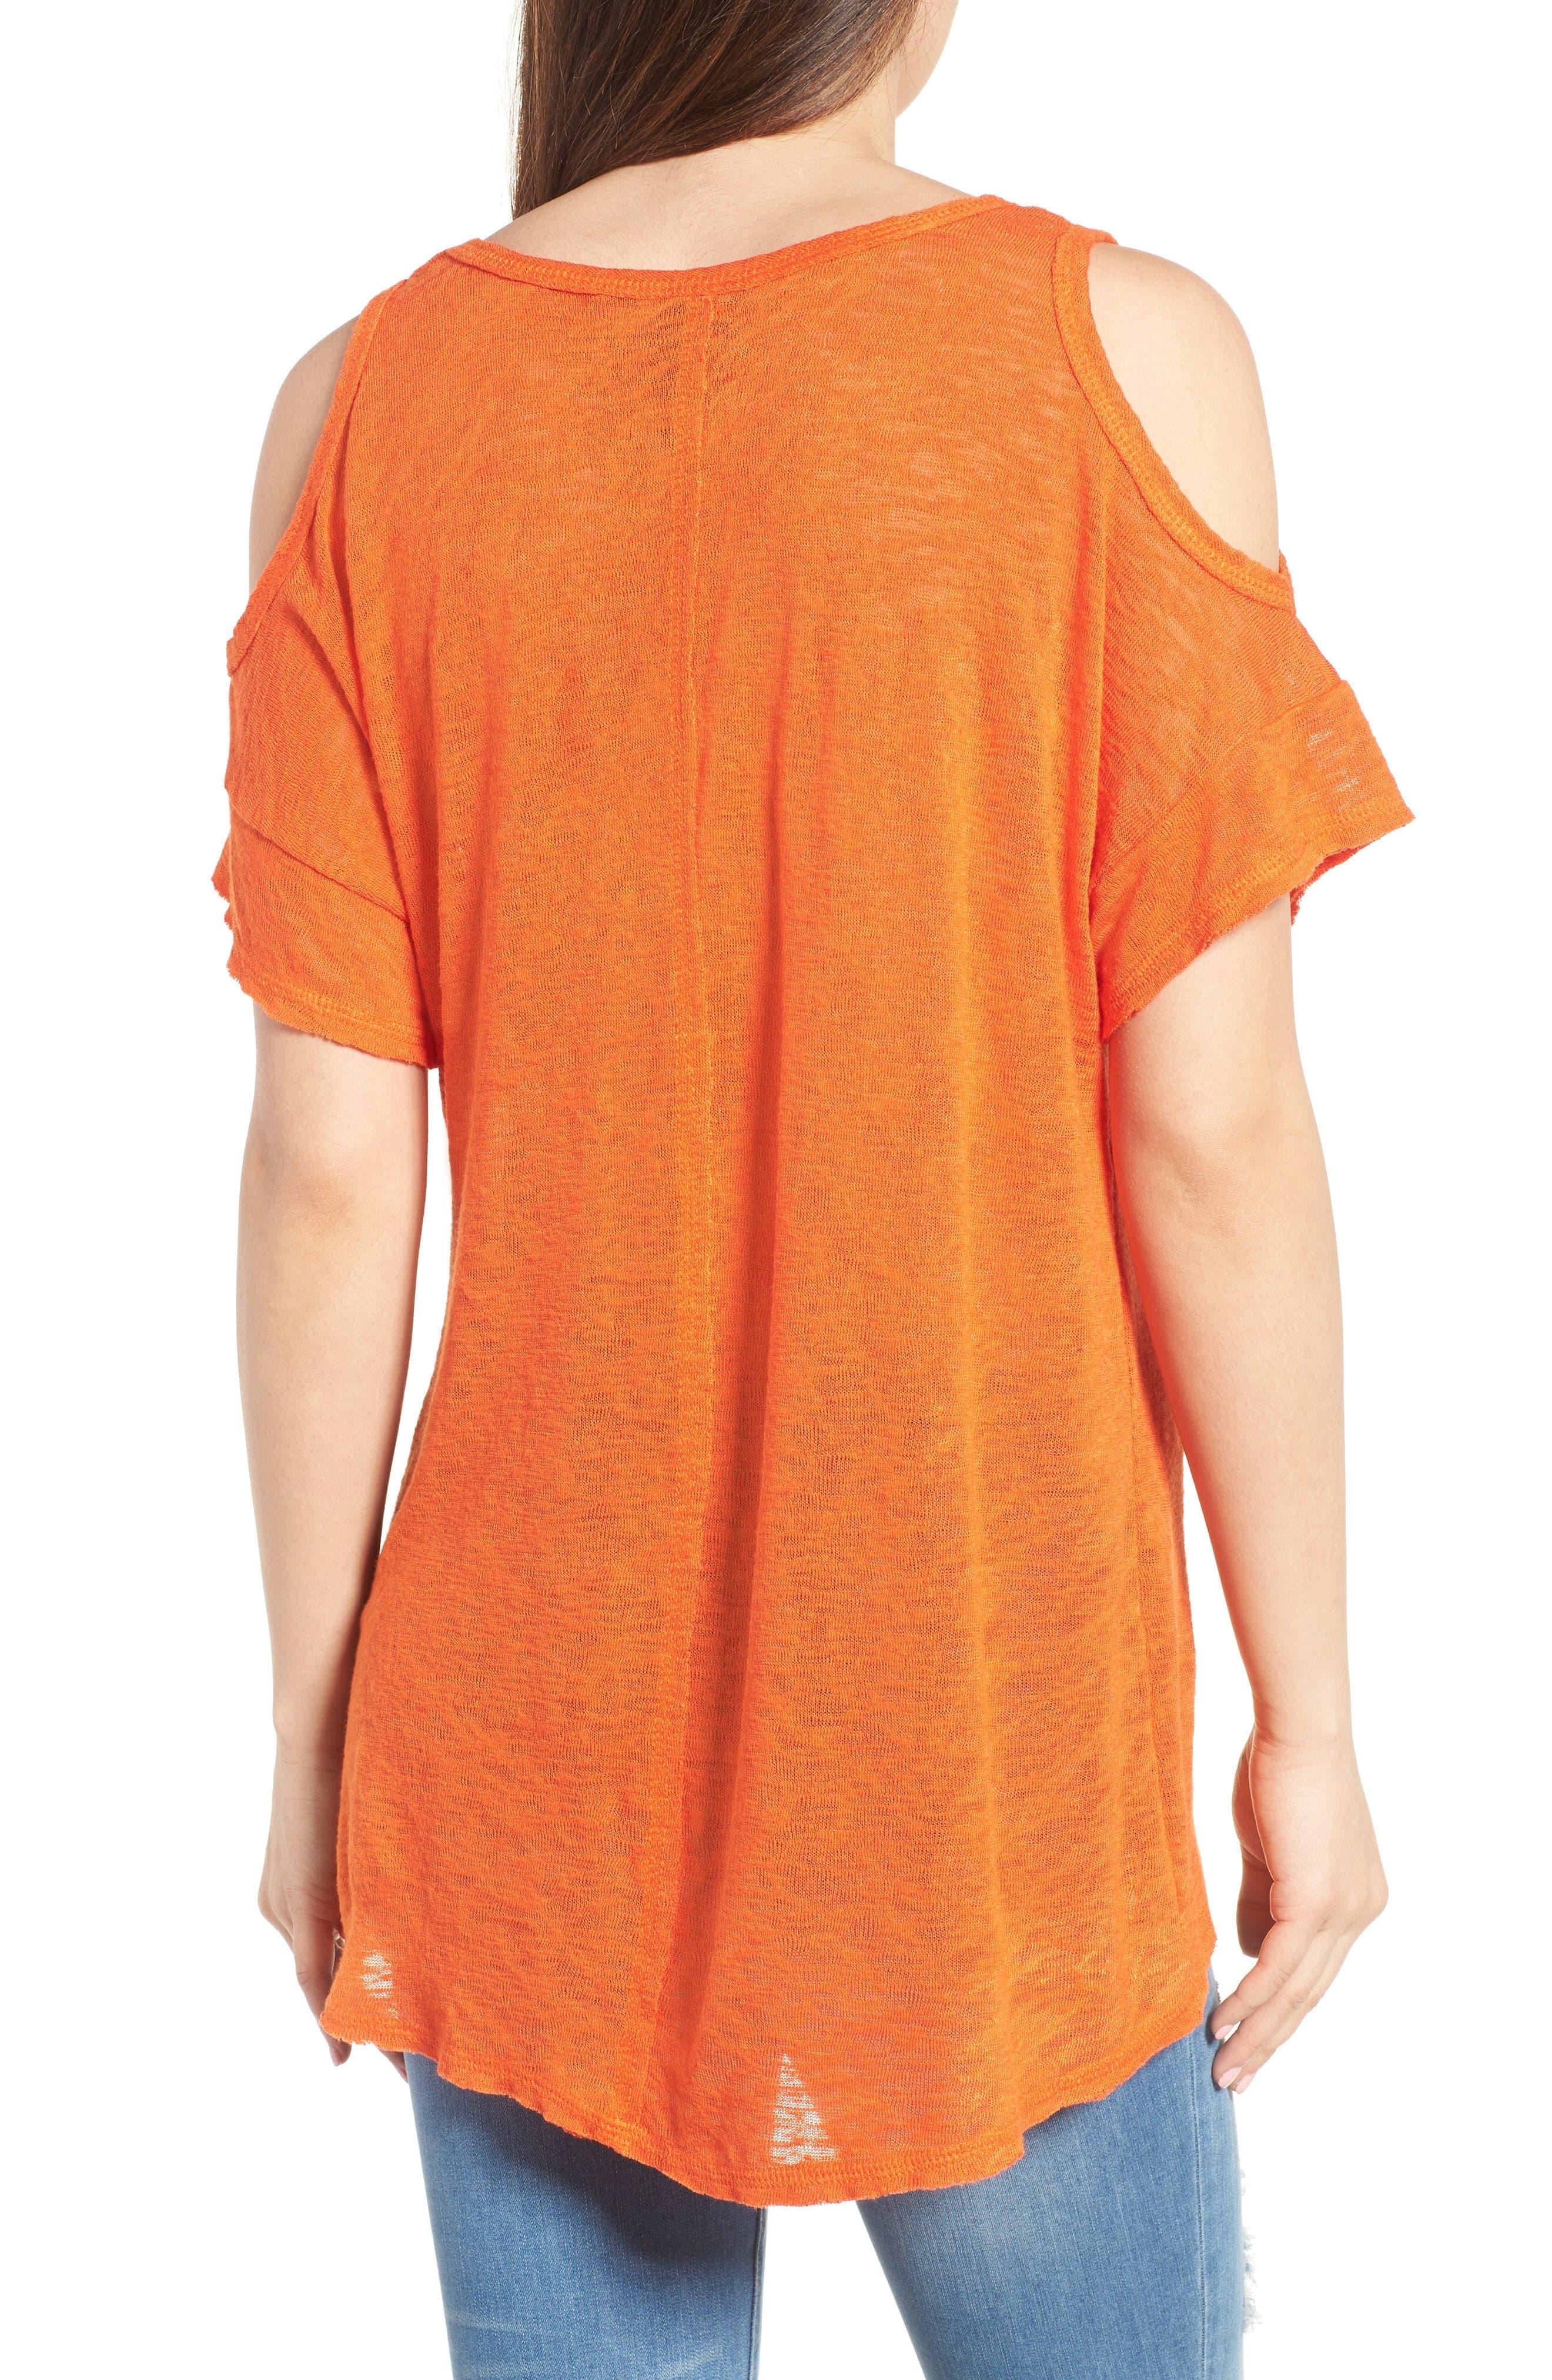 Alternate Image 2  - Bobeau Cold Shoulder Slub Knit Tee (Regular & Petite)